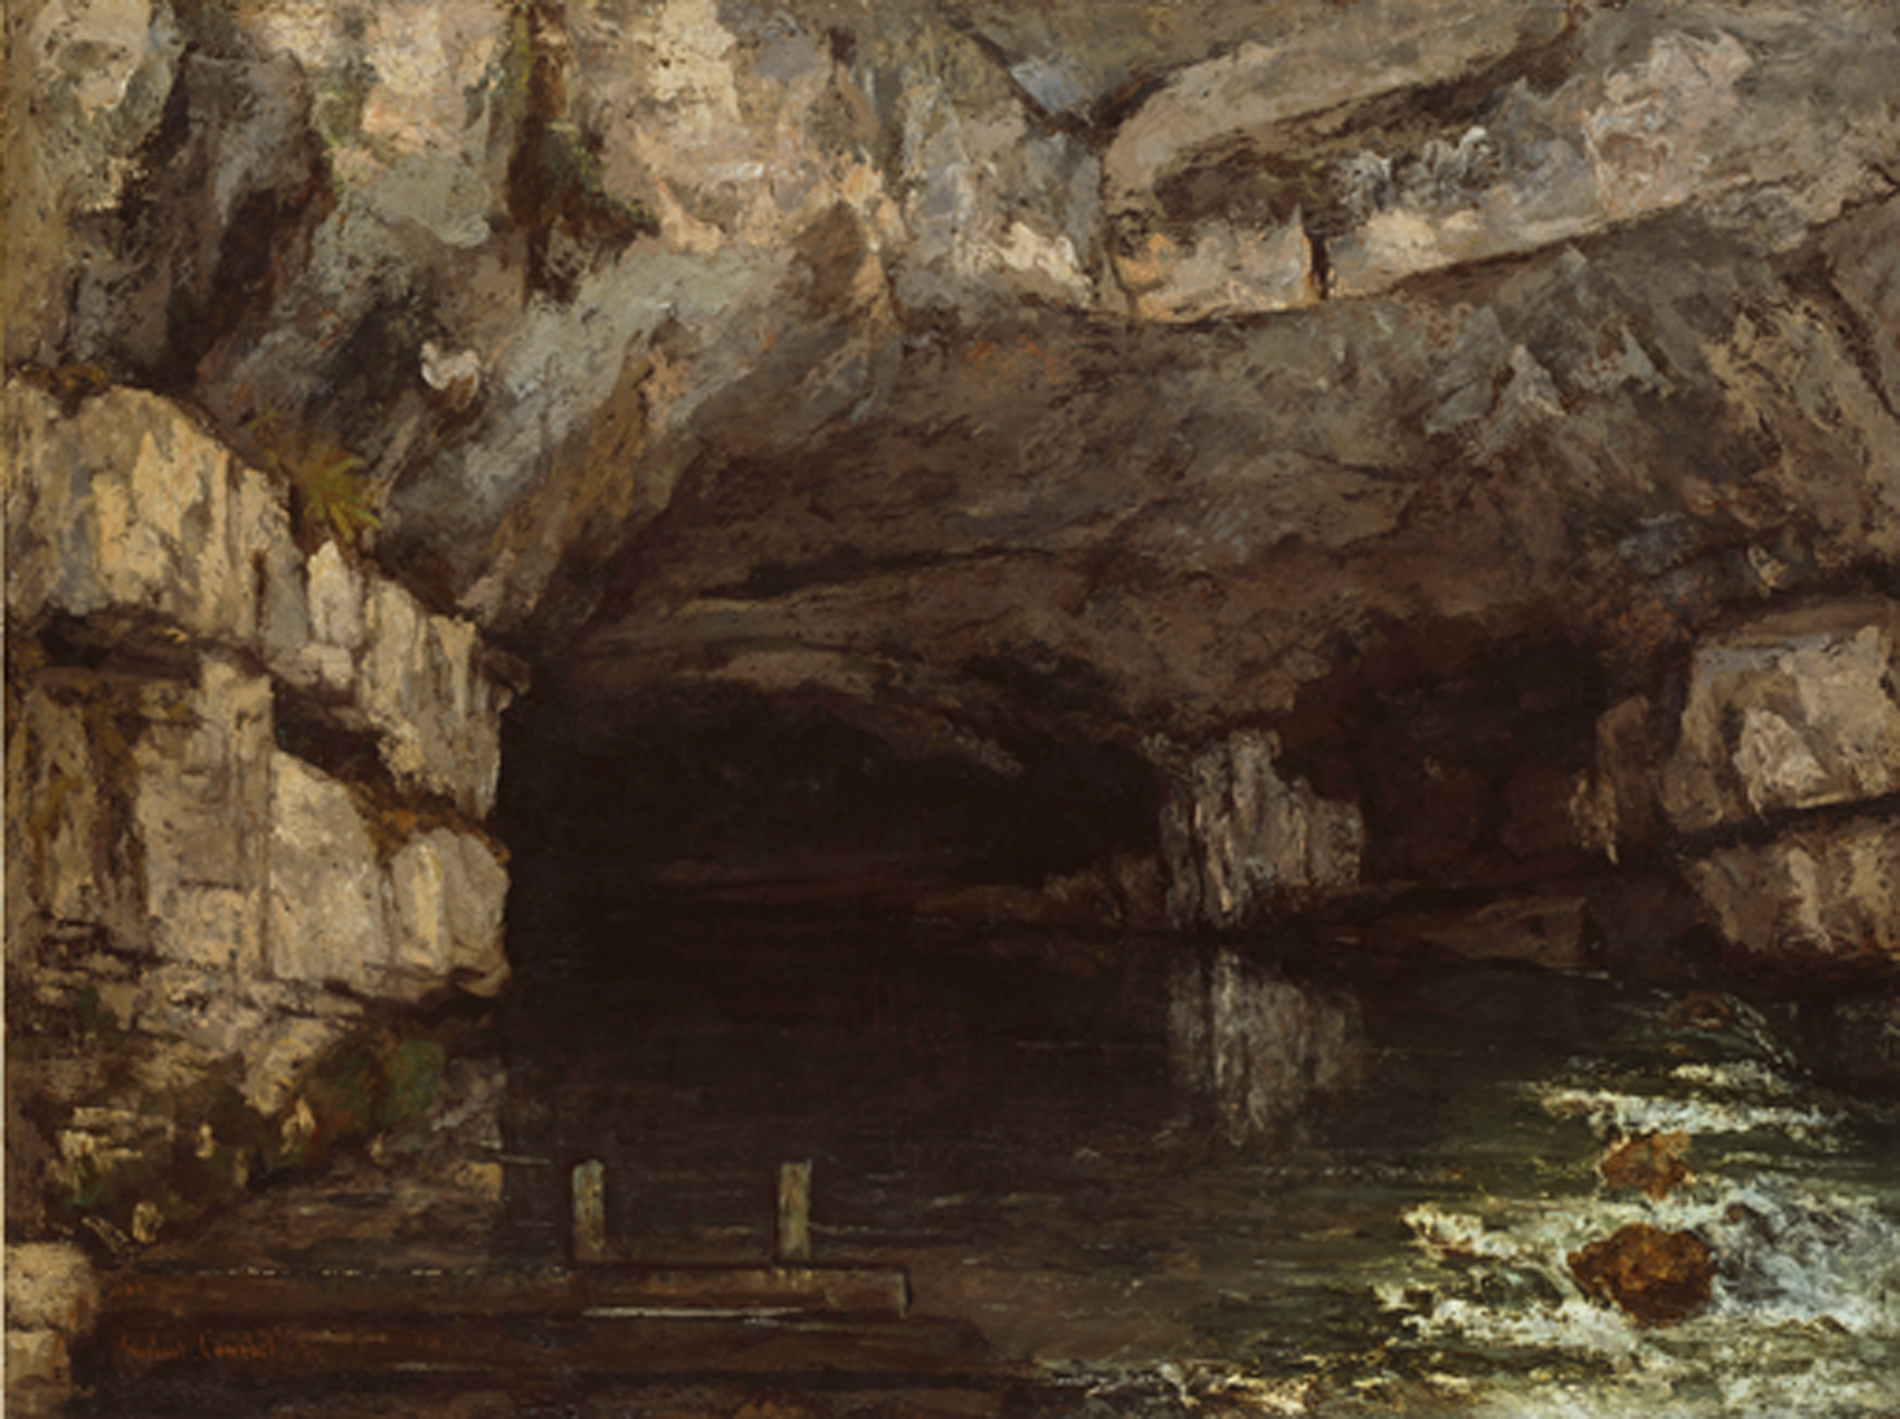 Gustave Courbet, (1819 - 1877), Die Grotte der Loue, 1864, © Hamburger Kunsthalle / bpk Foto: Elke Walford